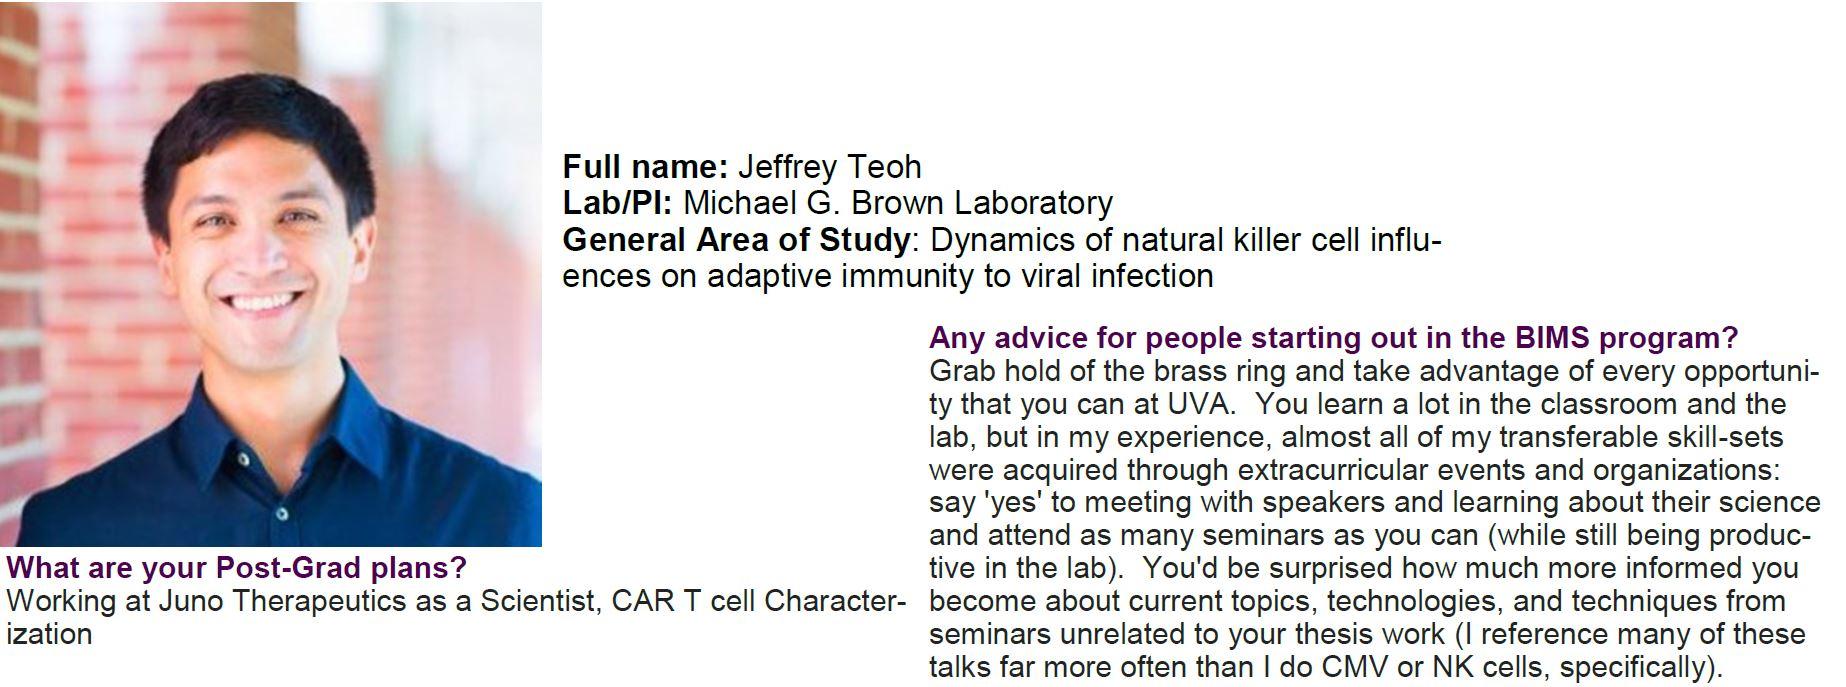 Jeffrey Teoh 1